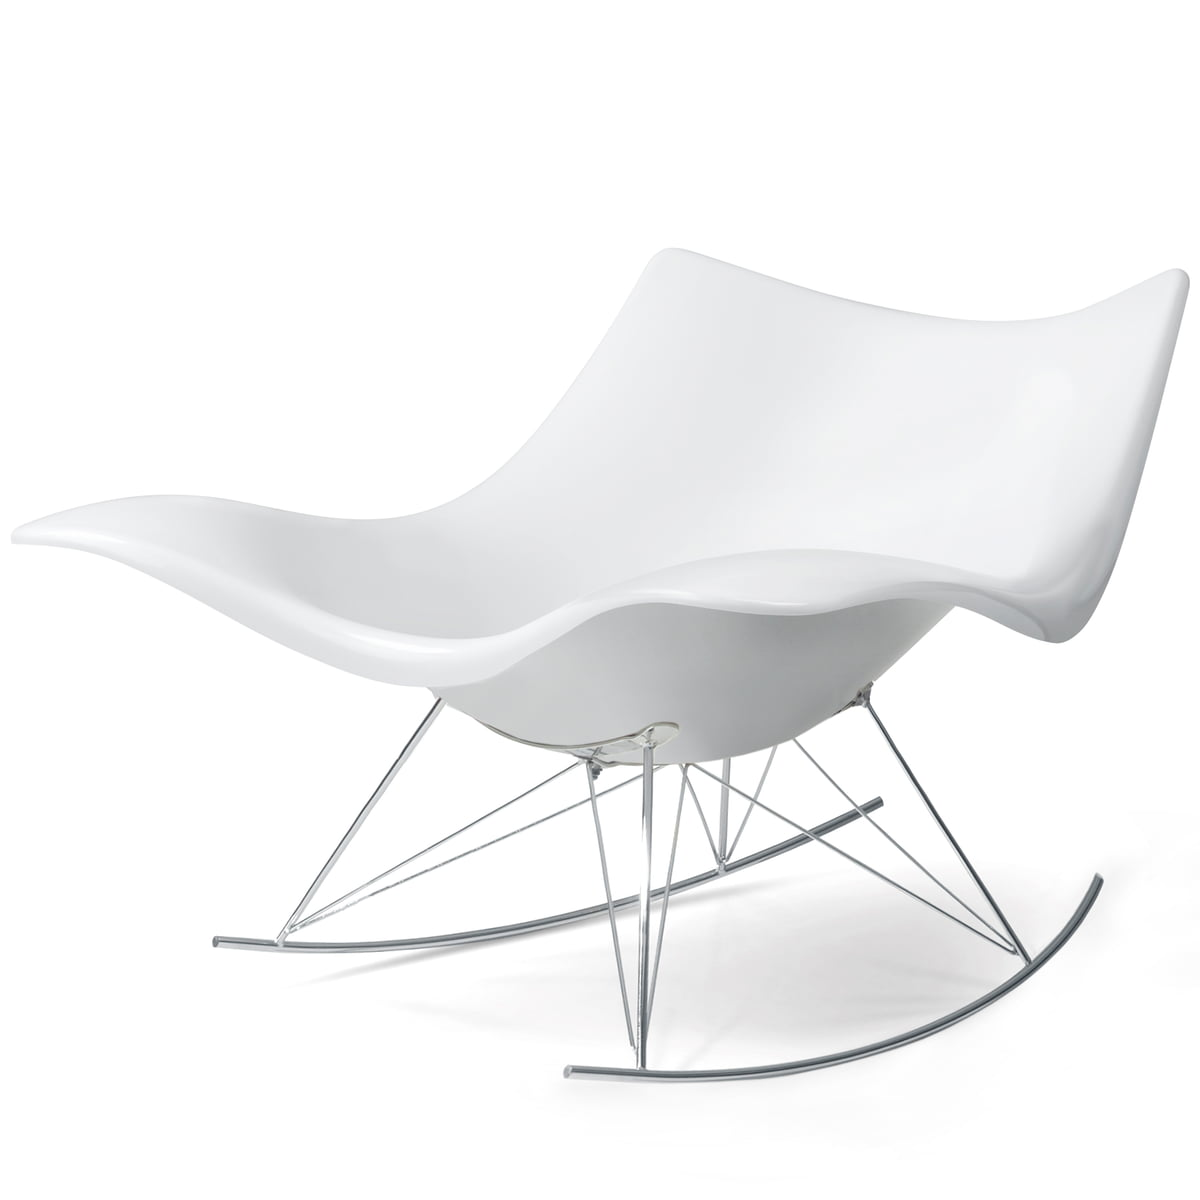 Terrific Fredericia Stingray Rocking Chair White Chrome Inzonedesignstudio Interior Chair Design Inzonedesignstudiocom